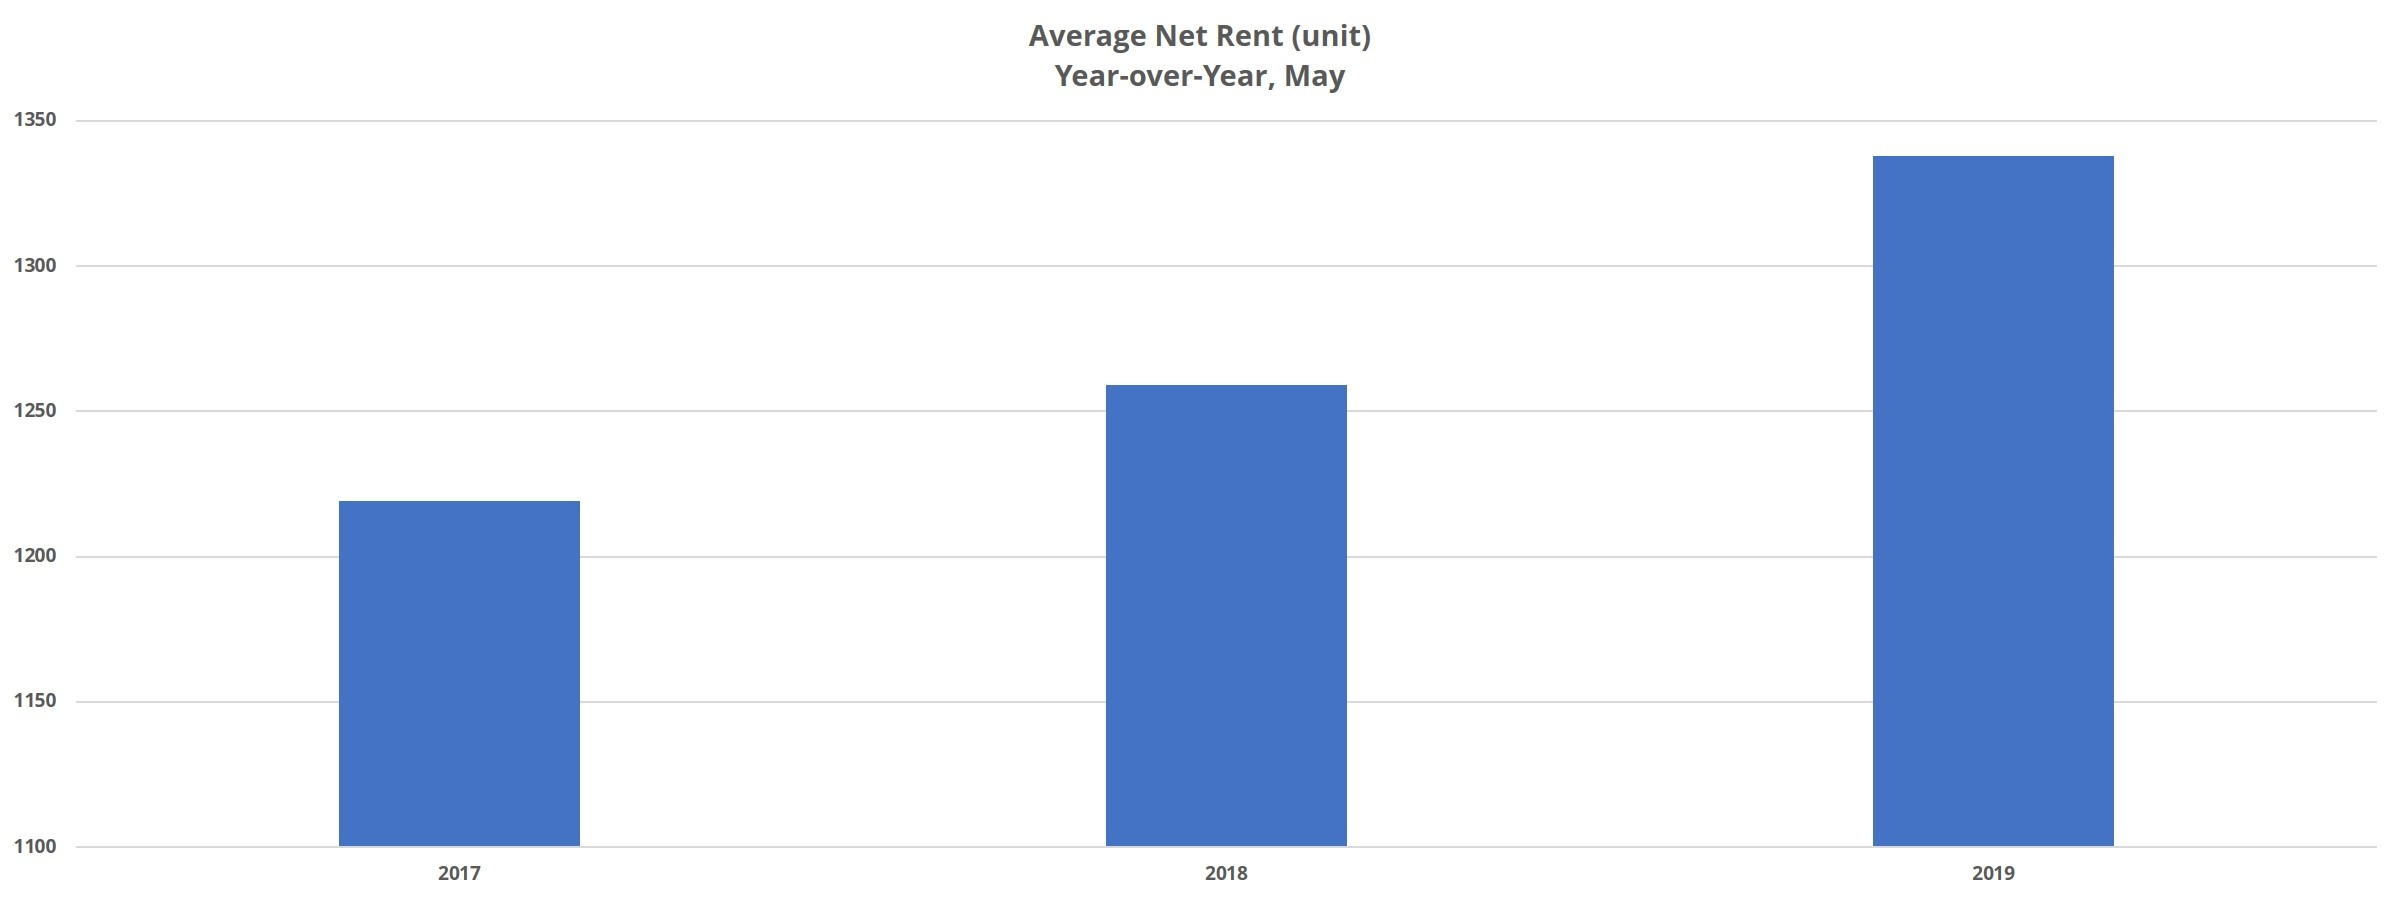 Average Net Rent in Denver